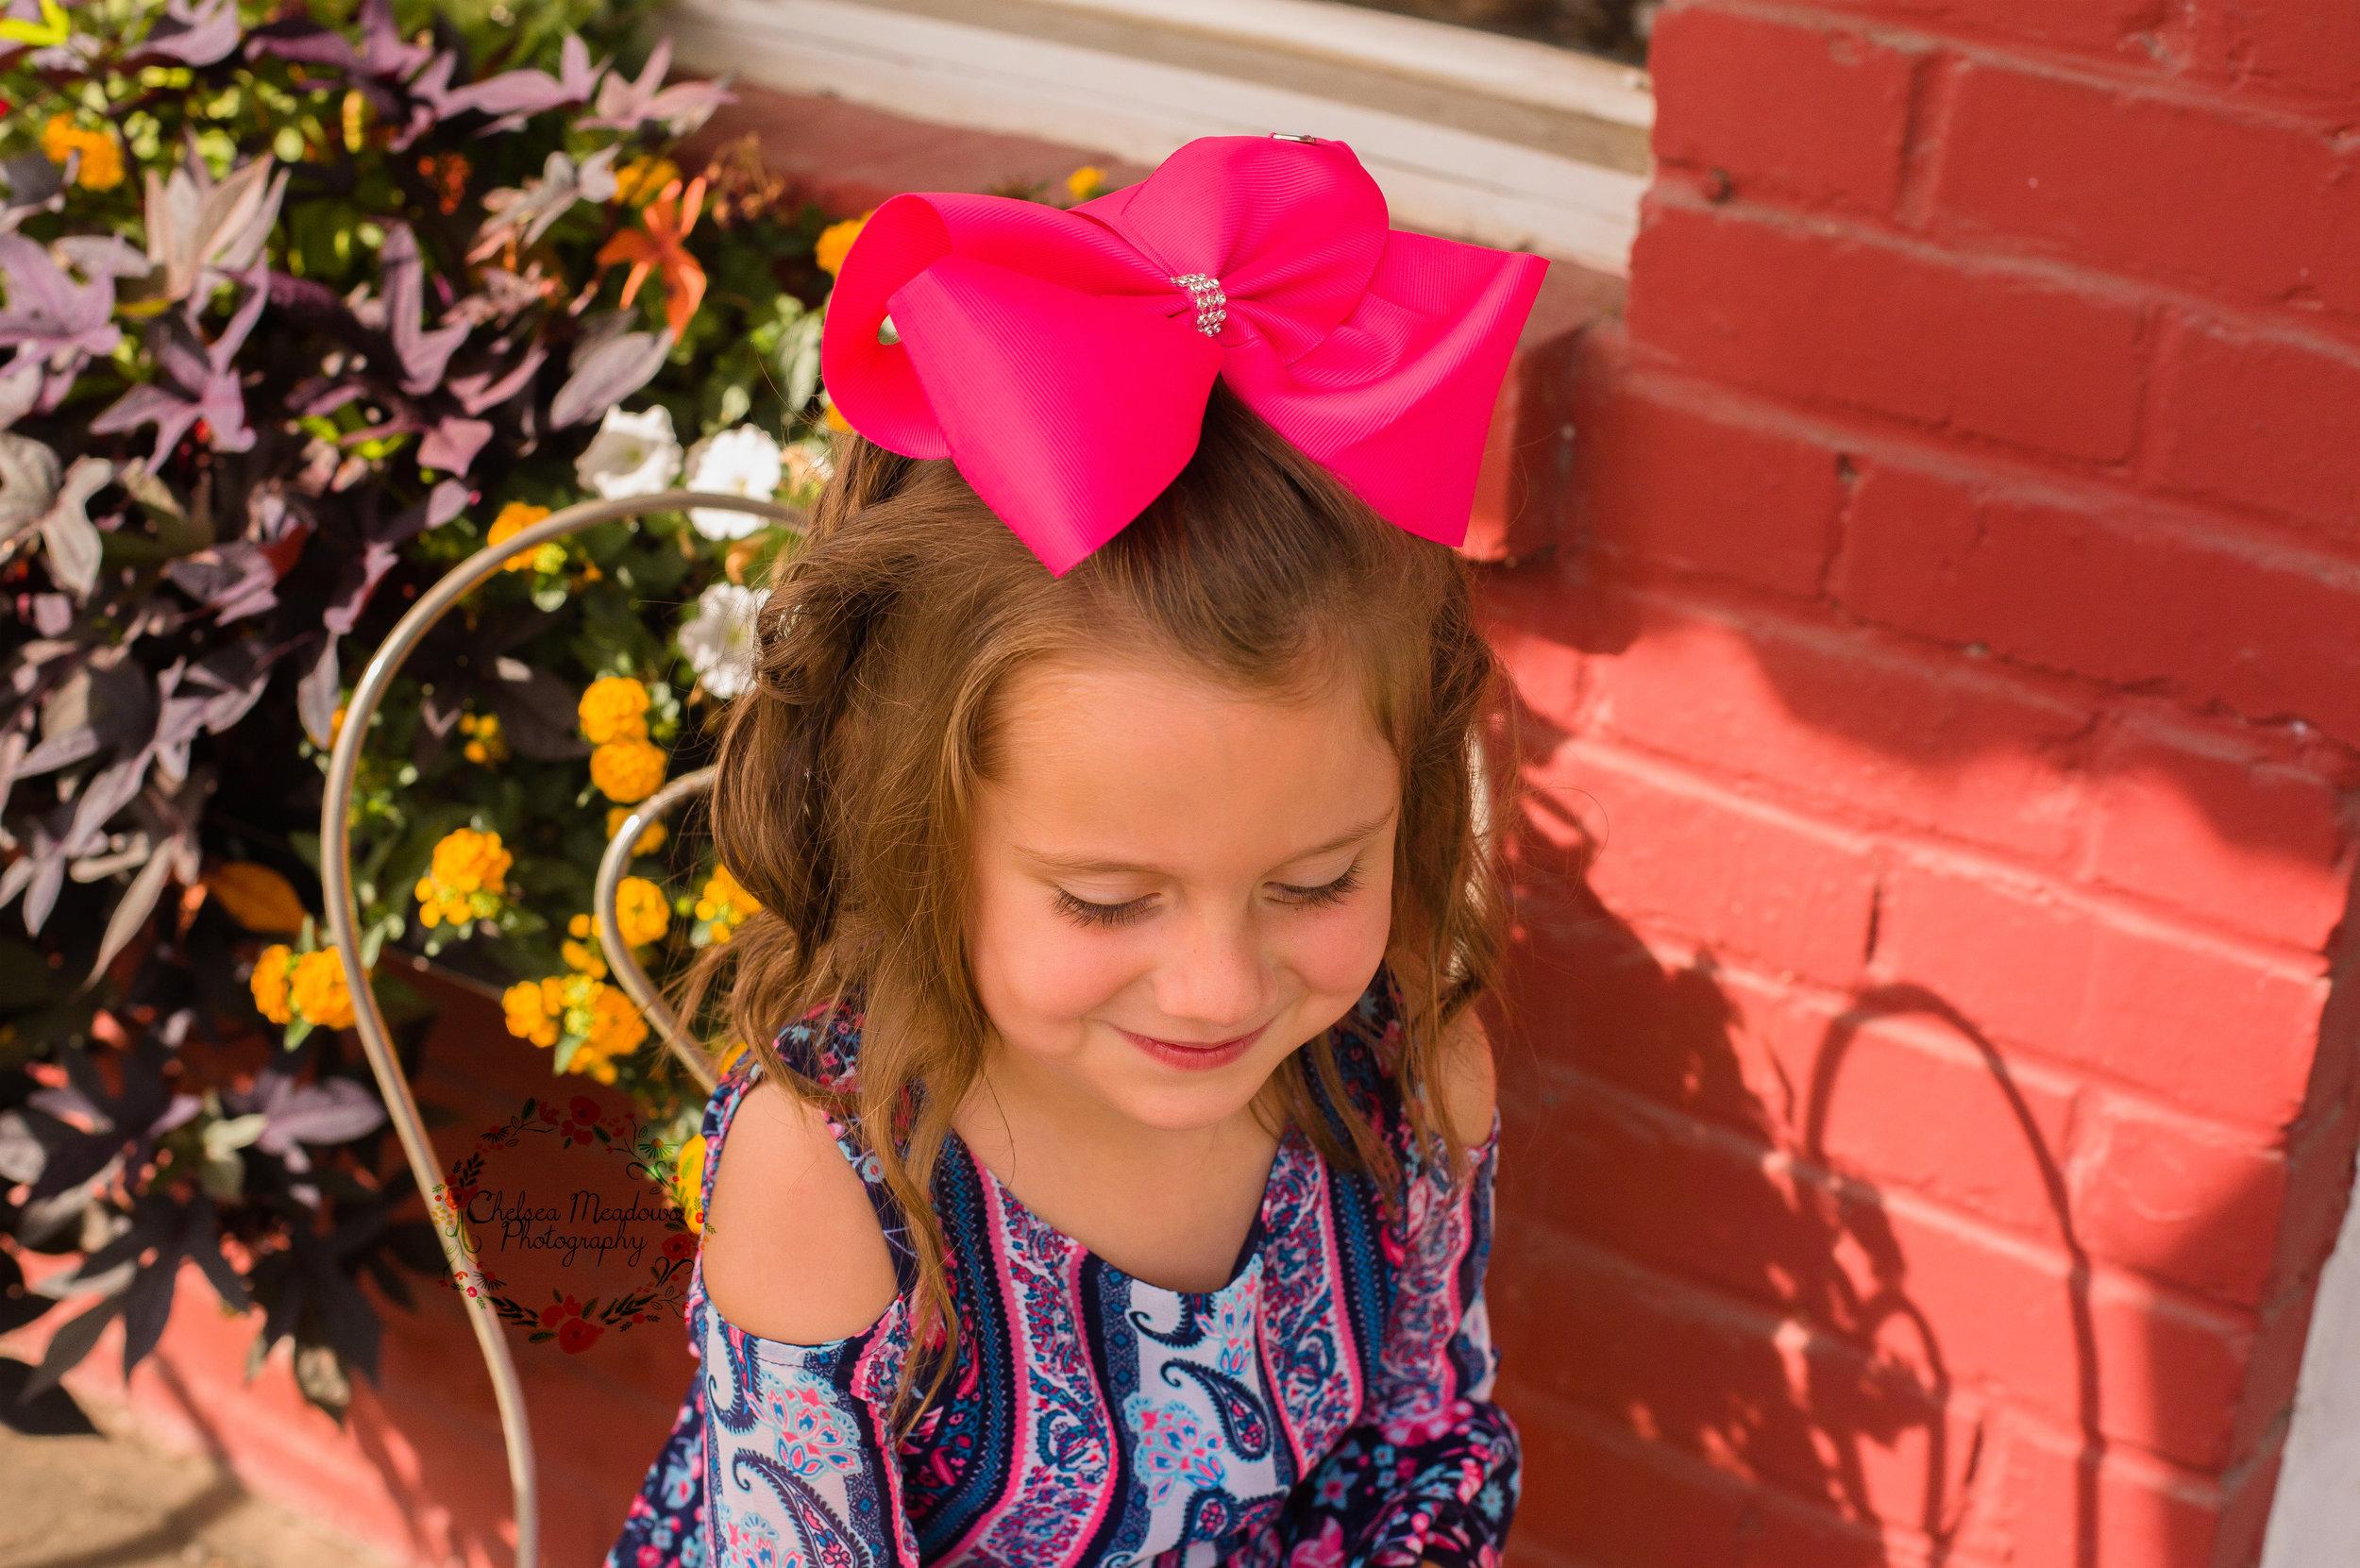 April 6th Birthday - Nashville Family Photographer - Chelsea Meadows Photography (25).jpg